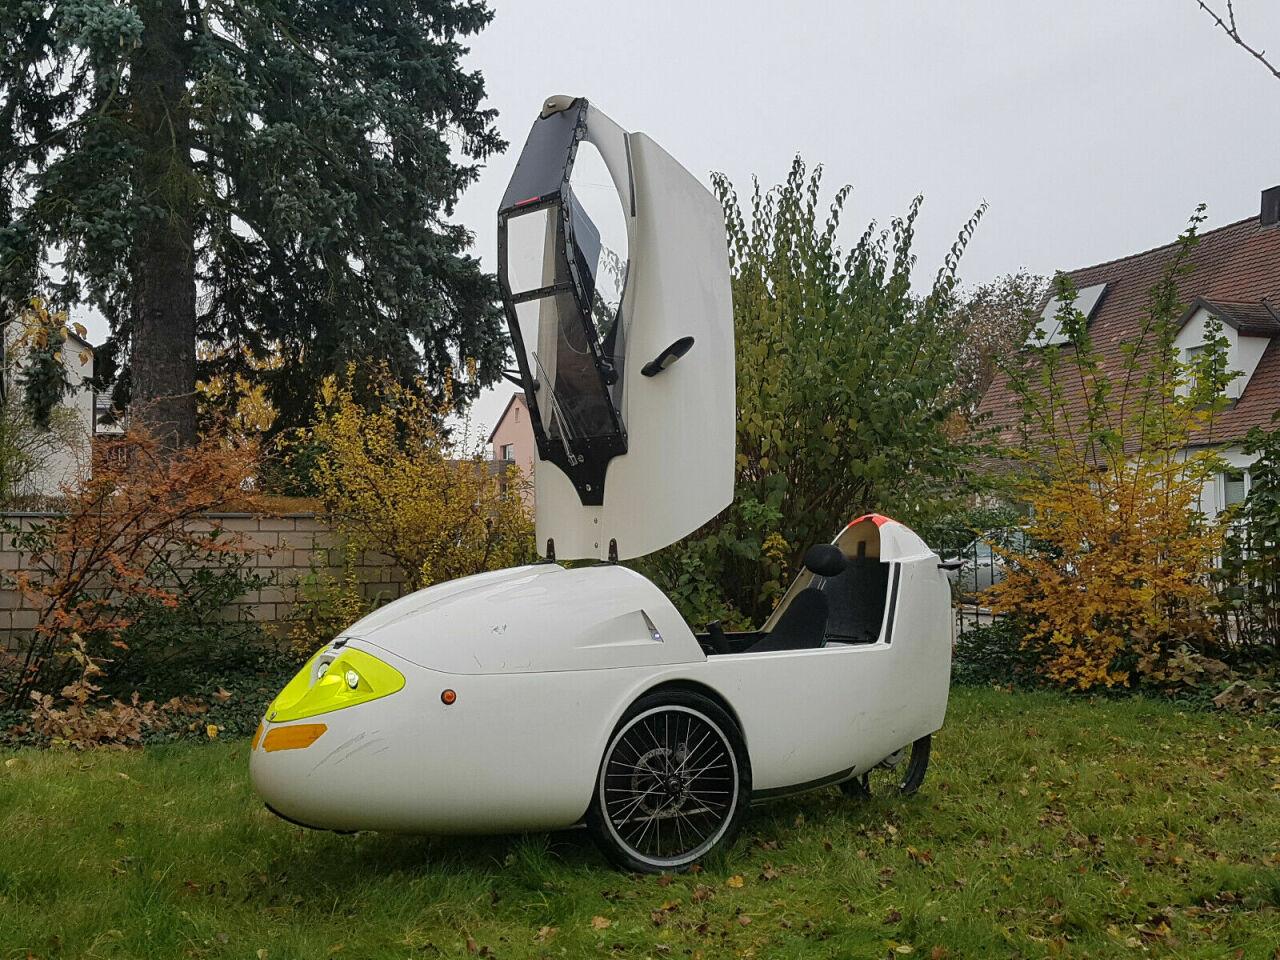 Velomobil Sunrider Hybrid, Beschleunigung 0-40kmh